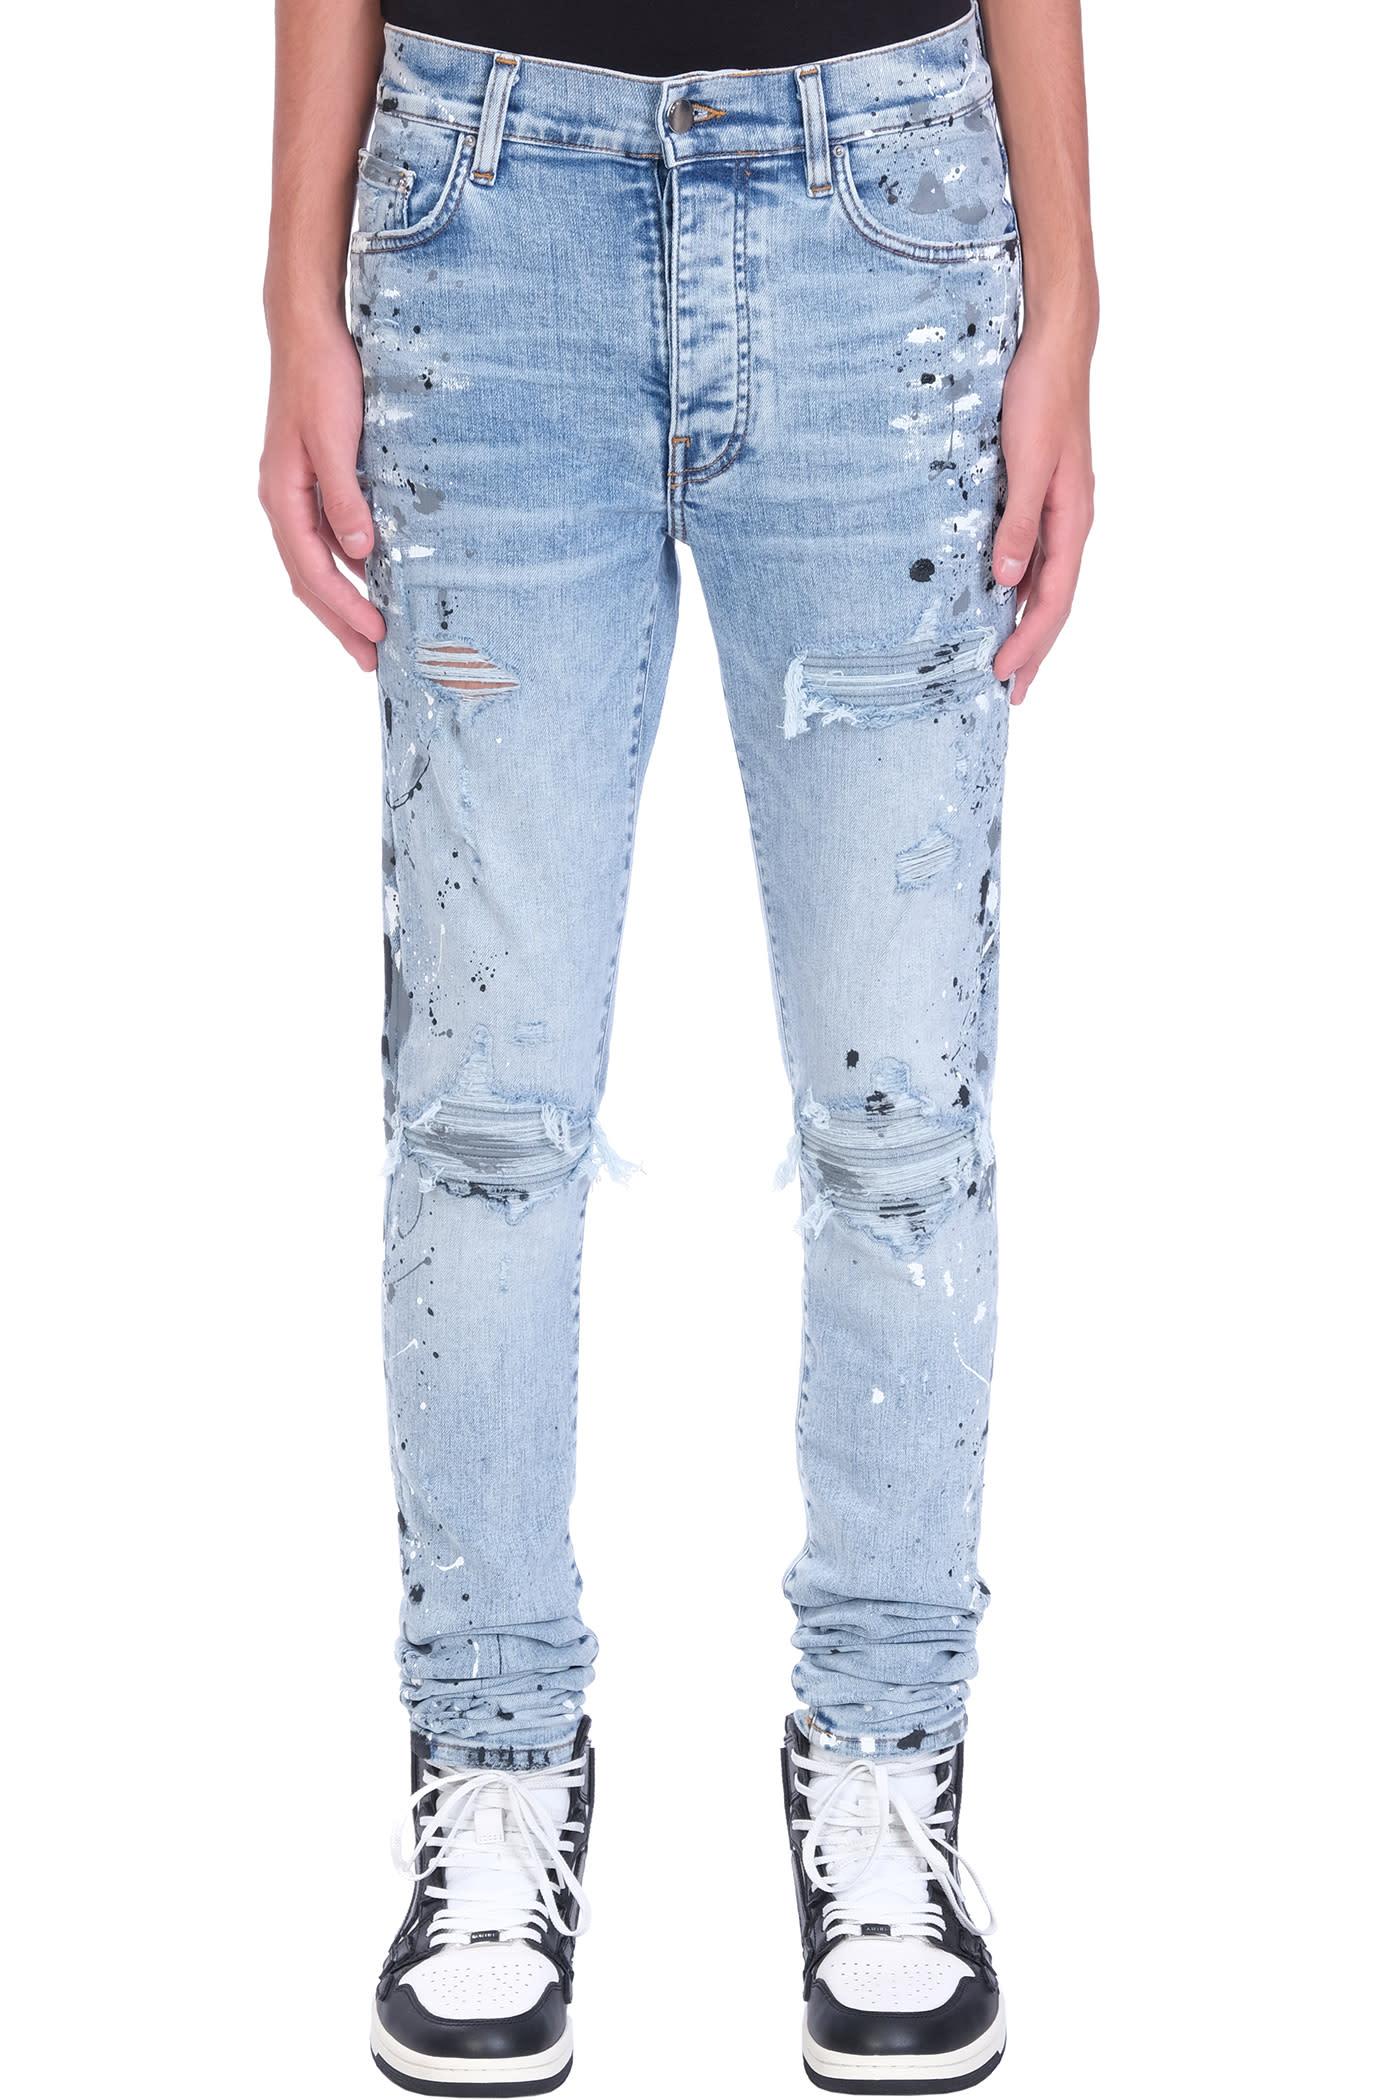 AMIRI Jeans In Cyan Cotton